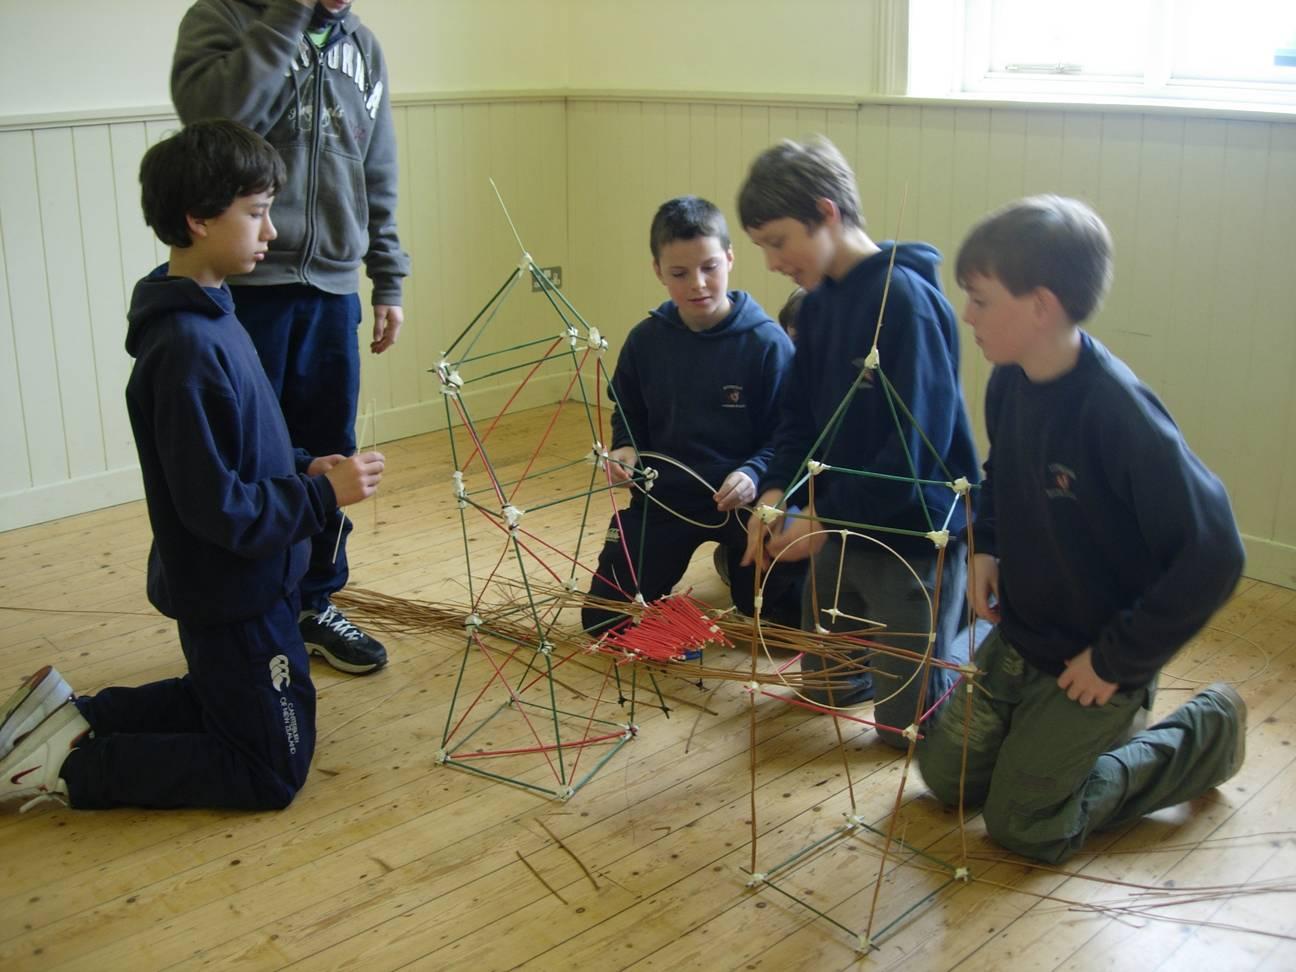 structures-MarieBrett-RathmichaelNS